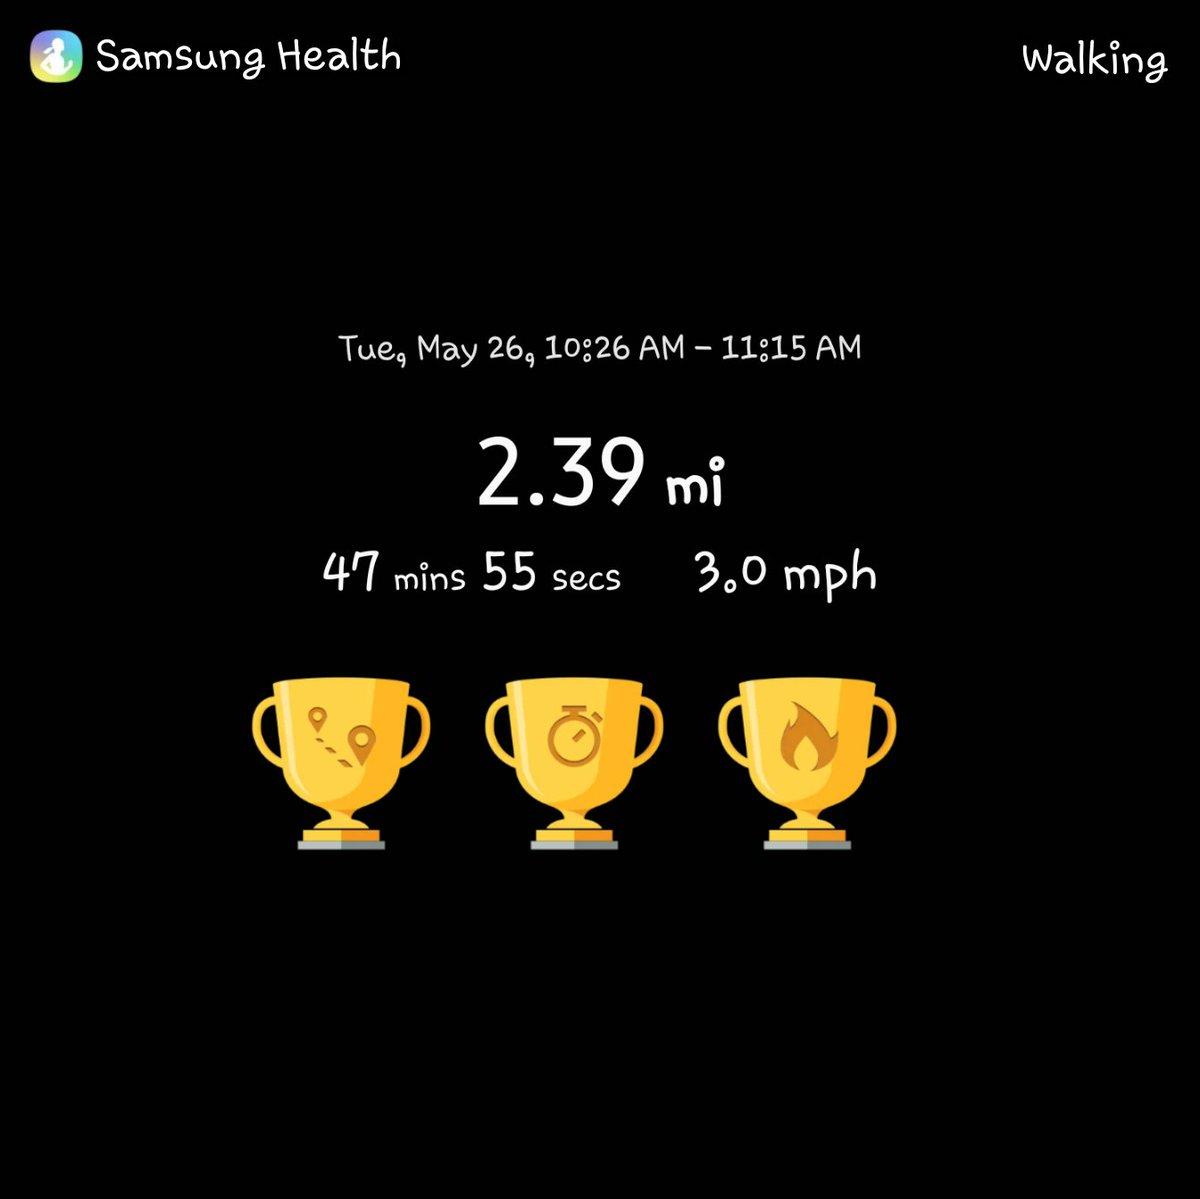 Yeaterdays walk...  #healthylifestyle pic.twitter.com/8auA6yQ8ob